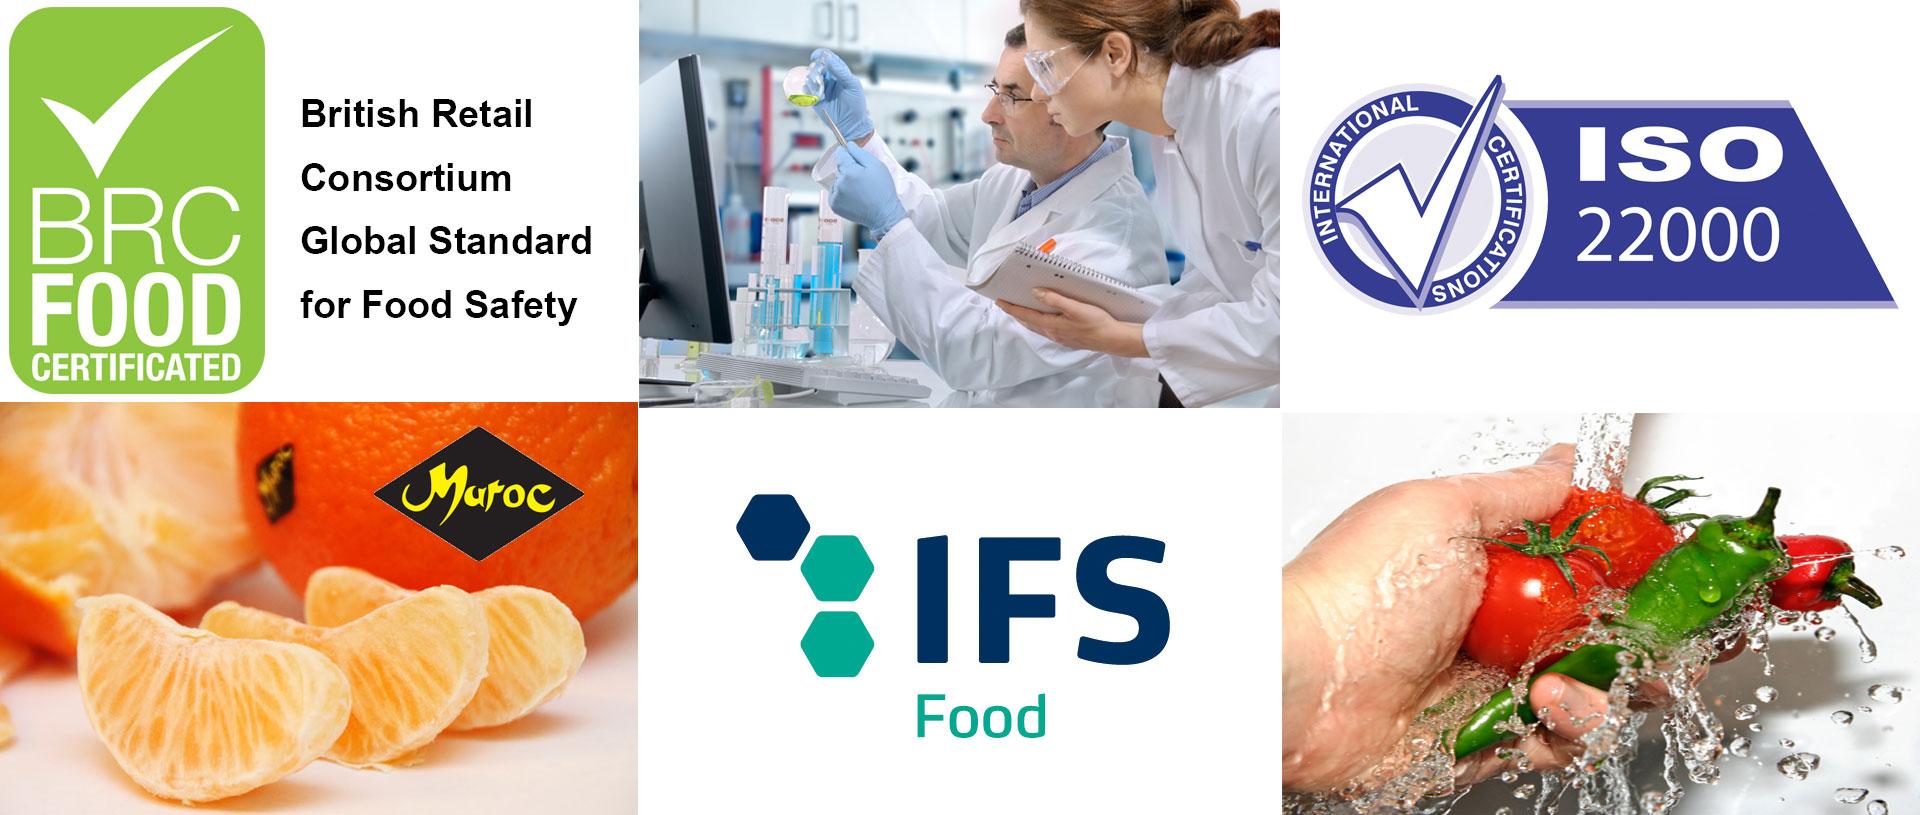 slider 2 BRC FOOD - IFS FOOD - ISO 22000 certificat